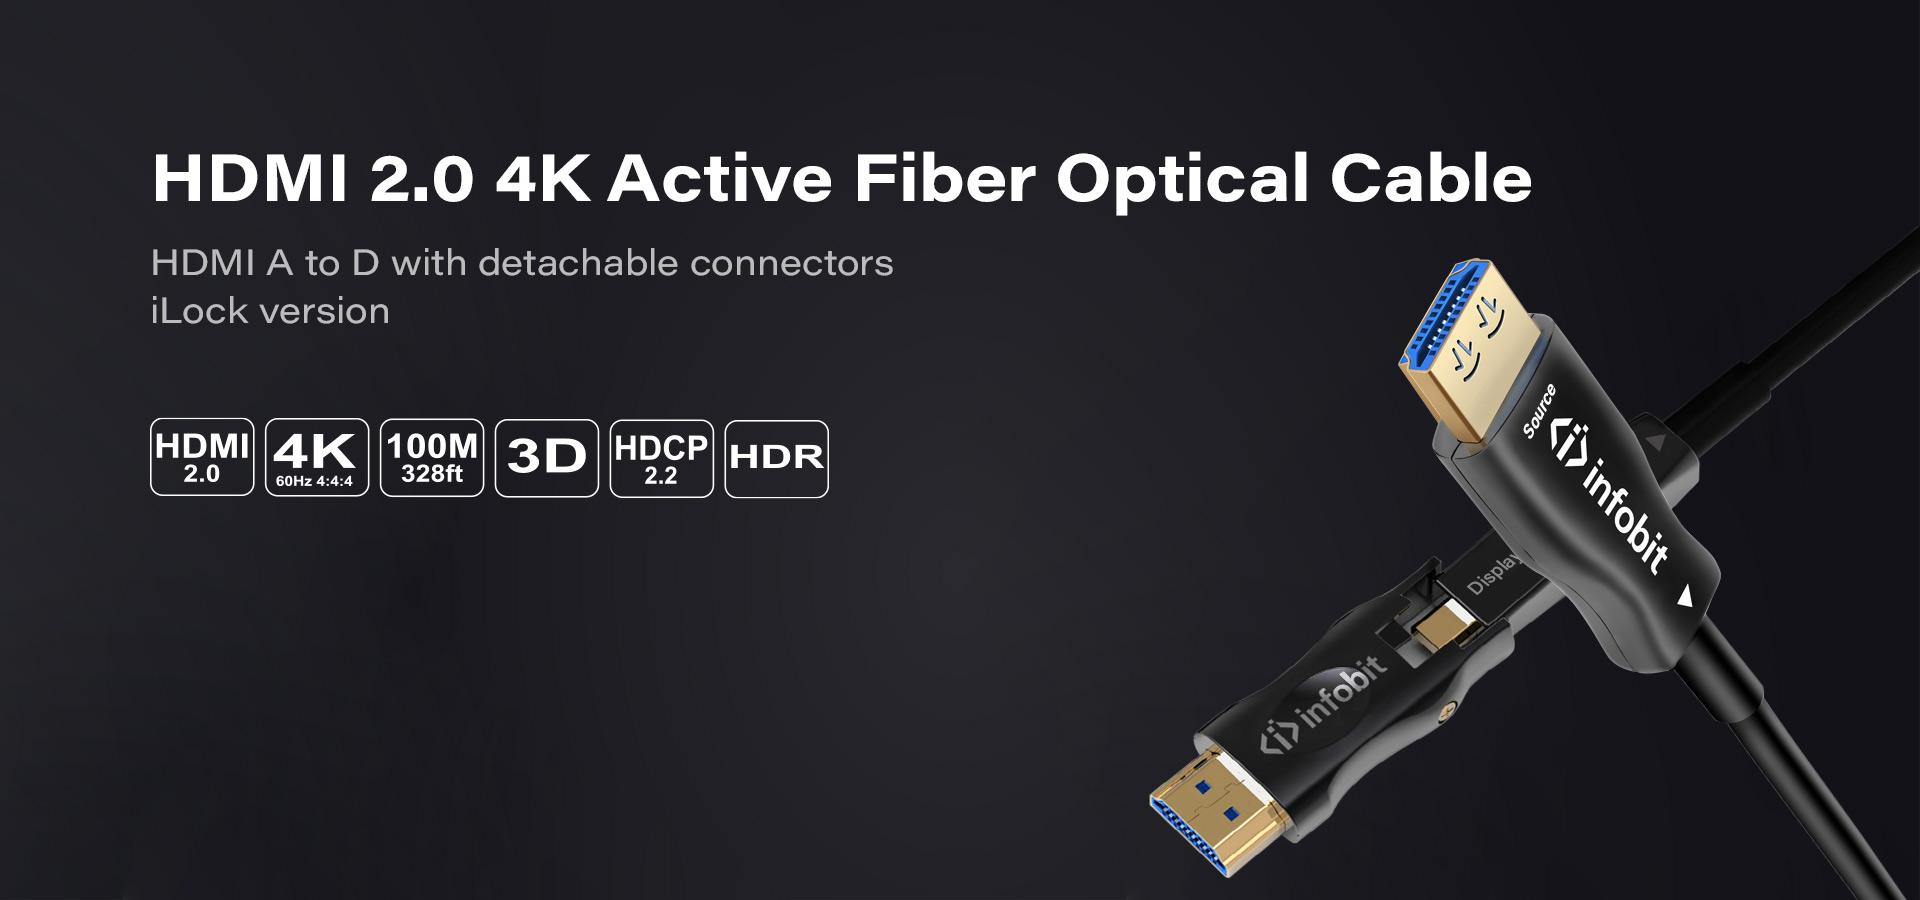 AD: HDMI A to D detachable connectors with iLock